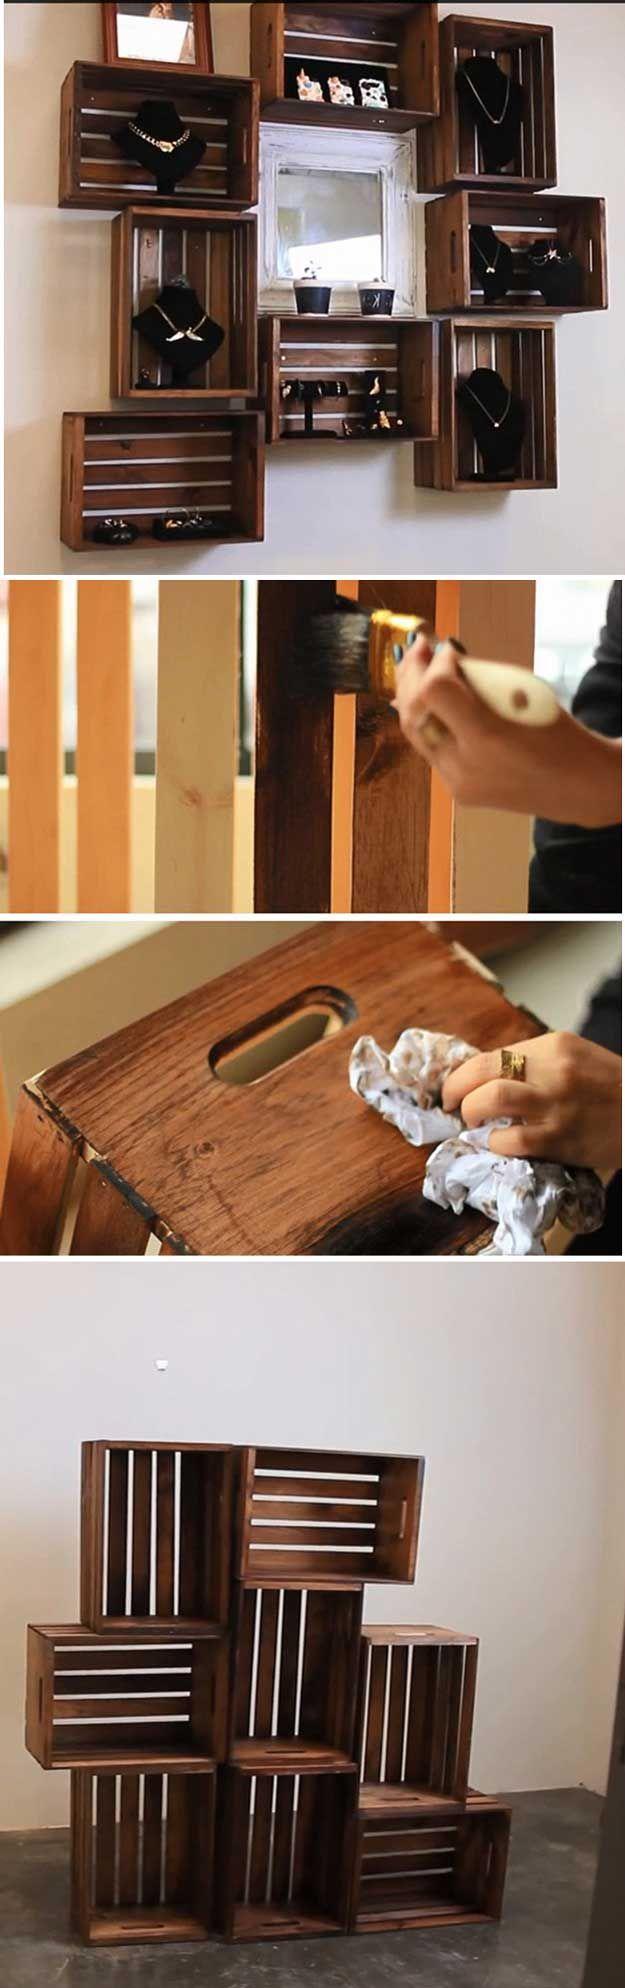 DIY Wooden Crate Shelves 26 Cool